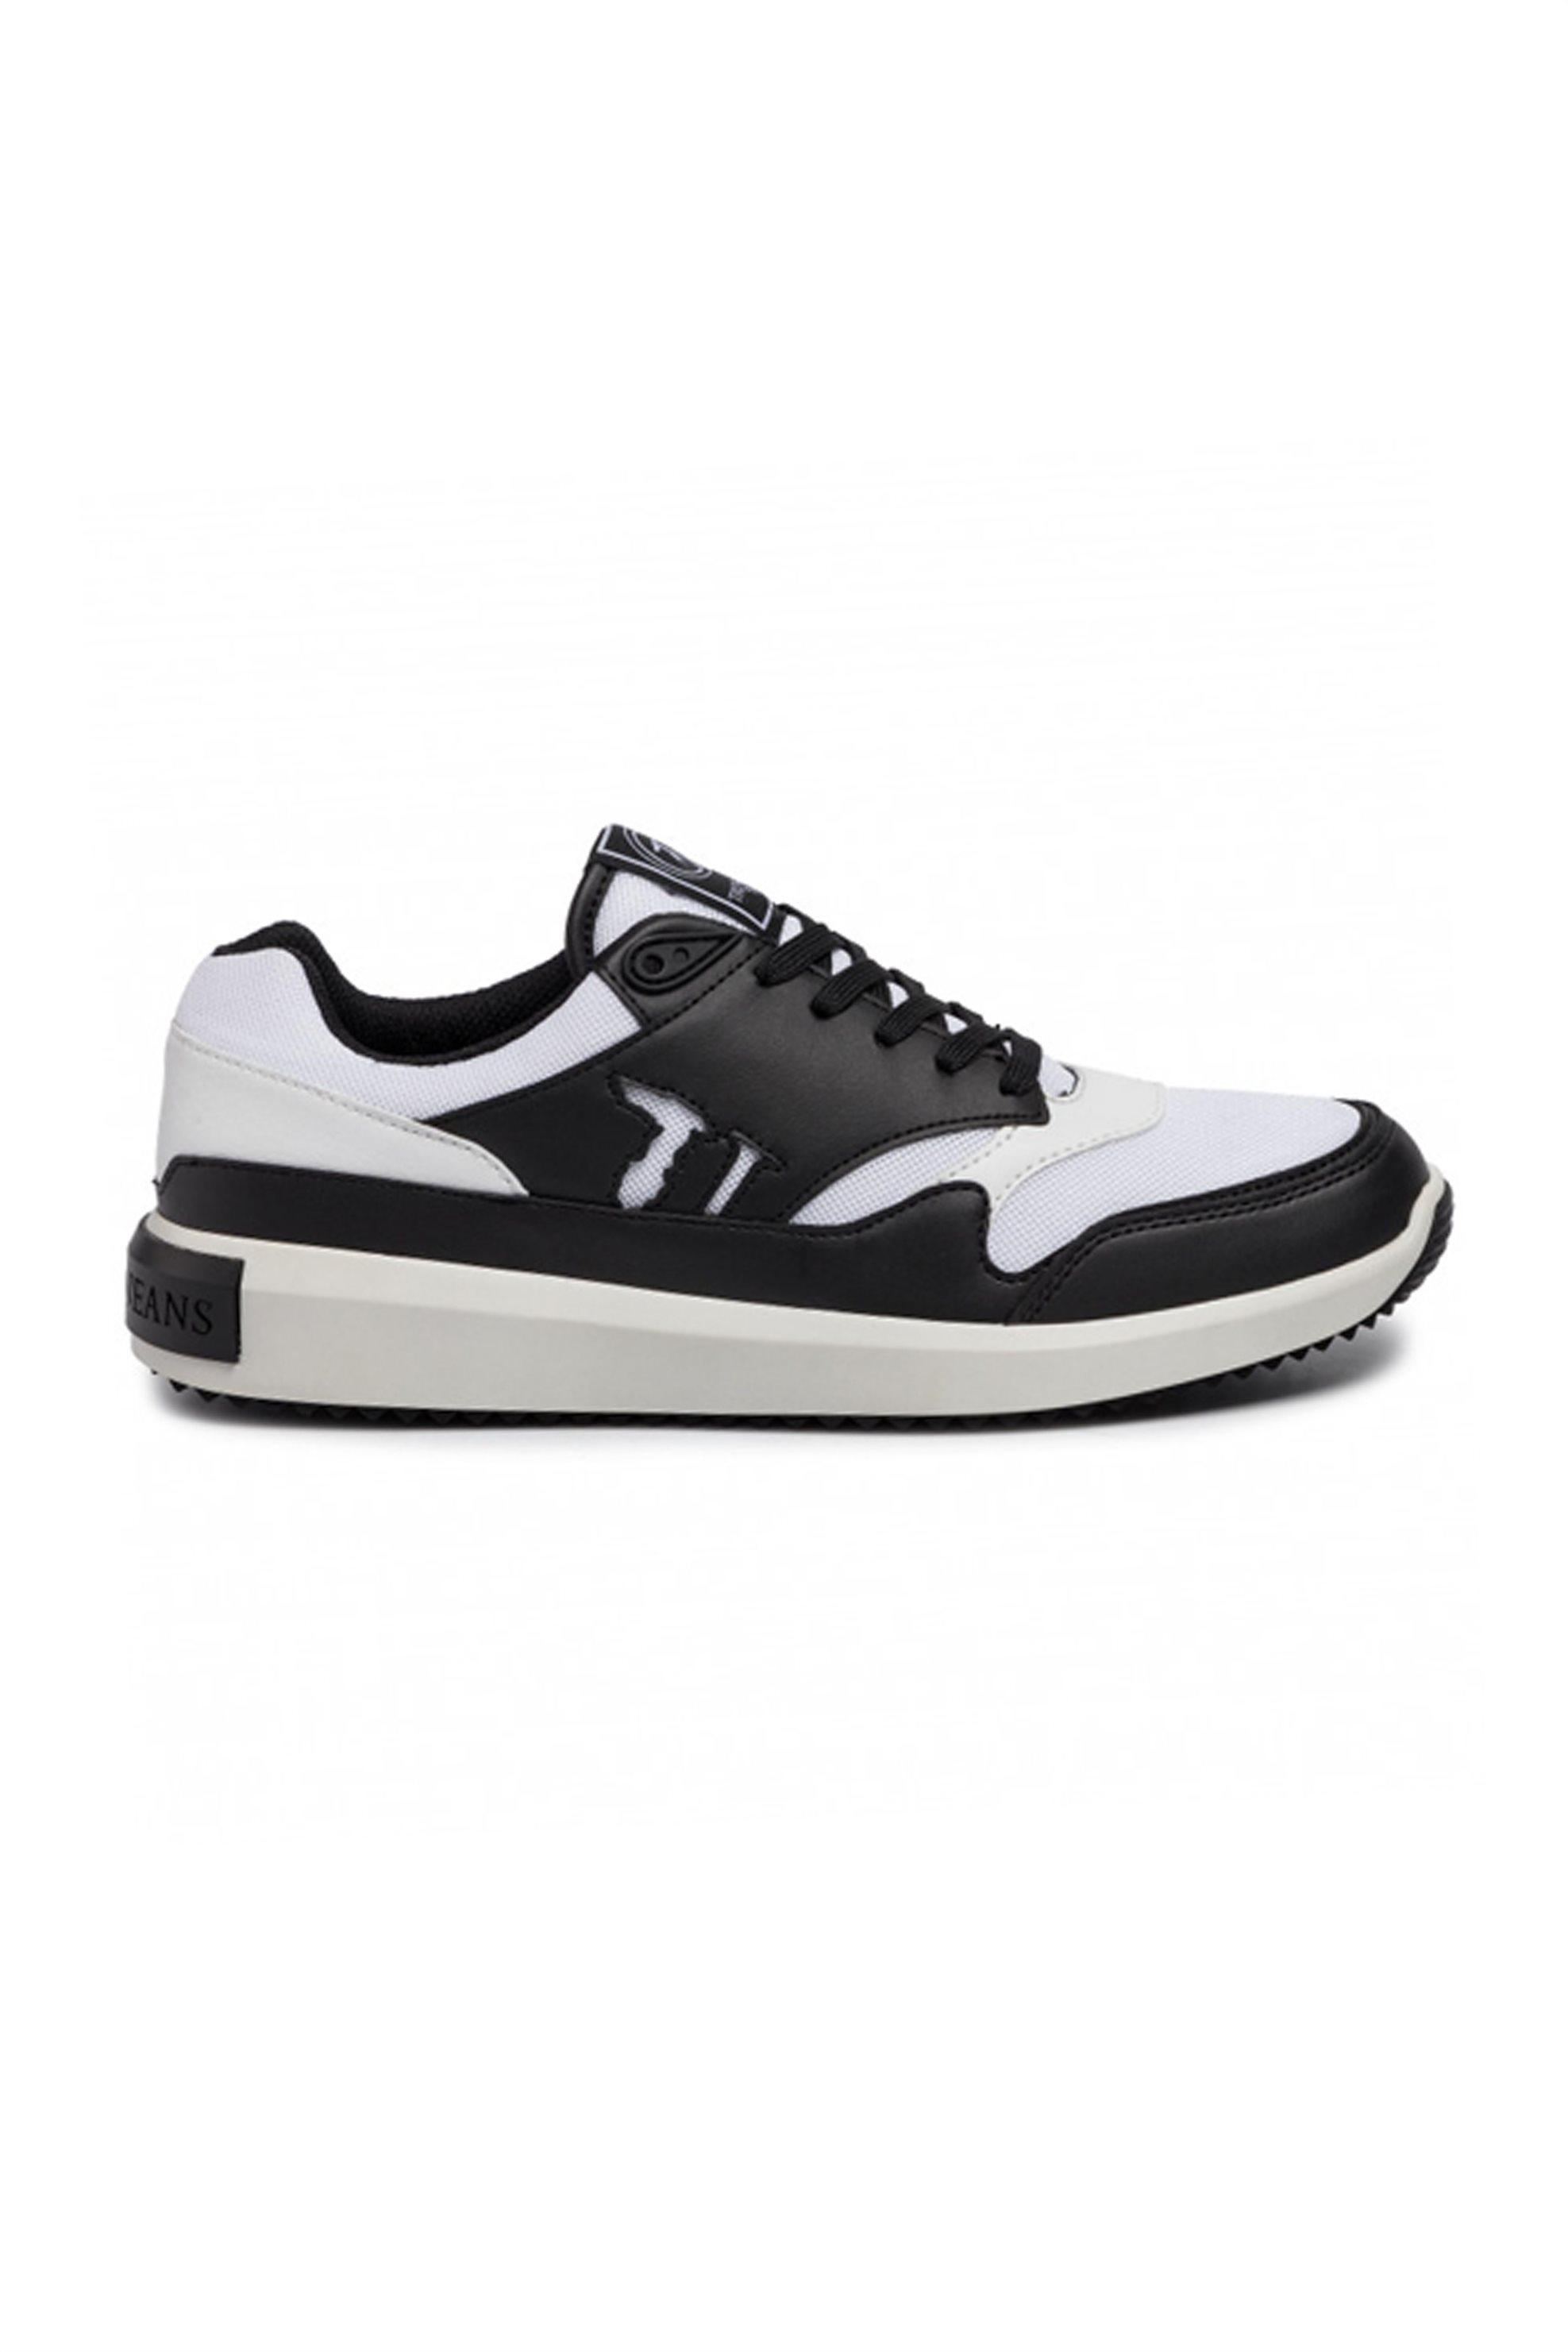 Trussardi ανδρικά sneakers colourblocked – 77A00184-9Y099999 – Μαύρο